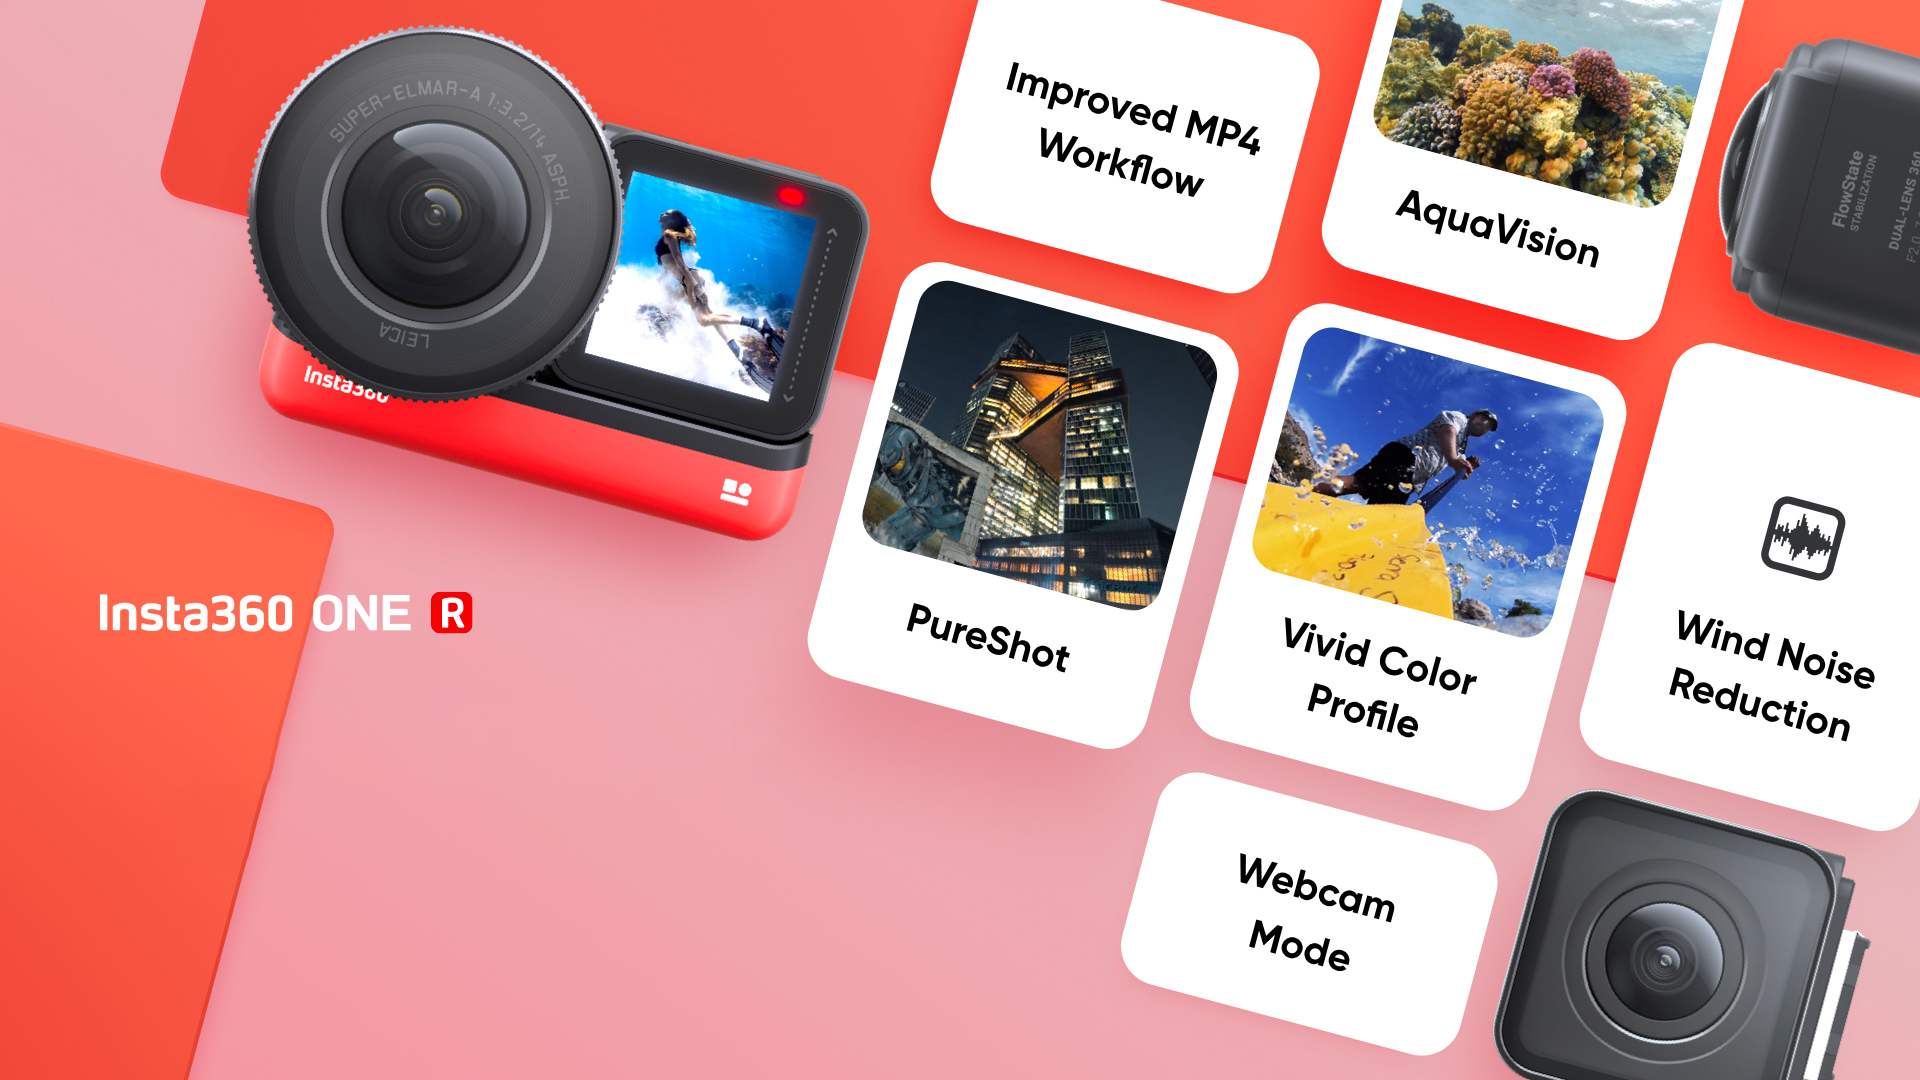 Insta360 ONE R firmware update. Image: Insta360.